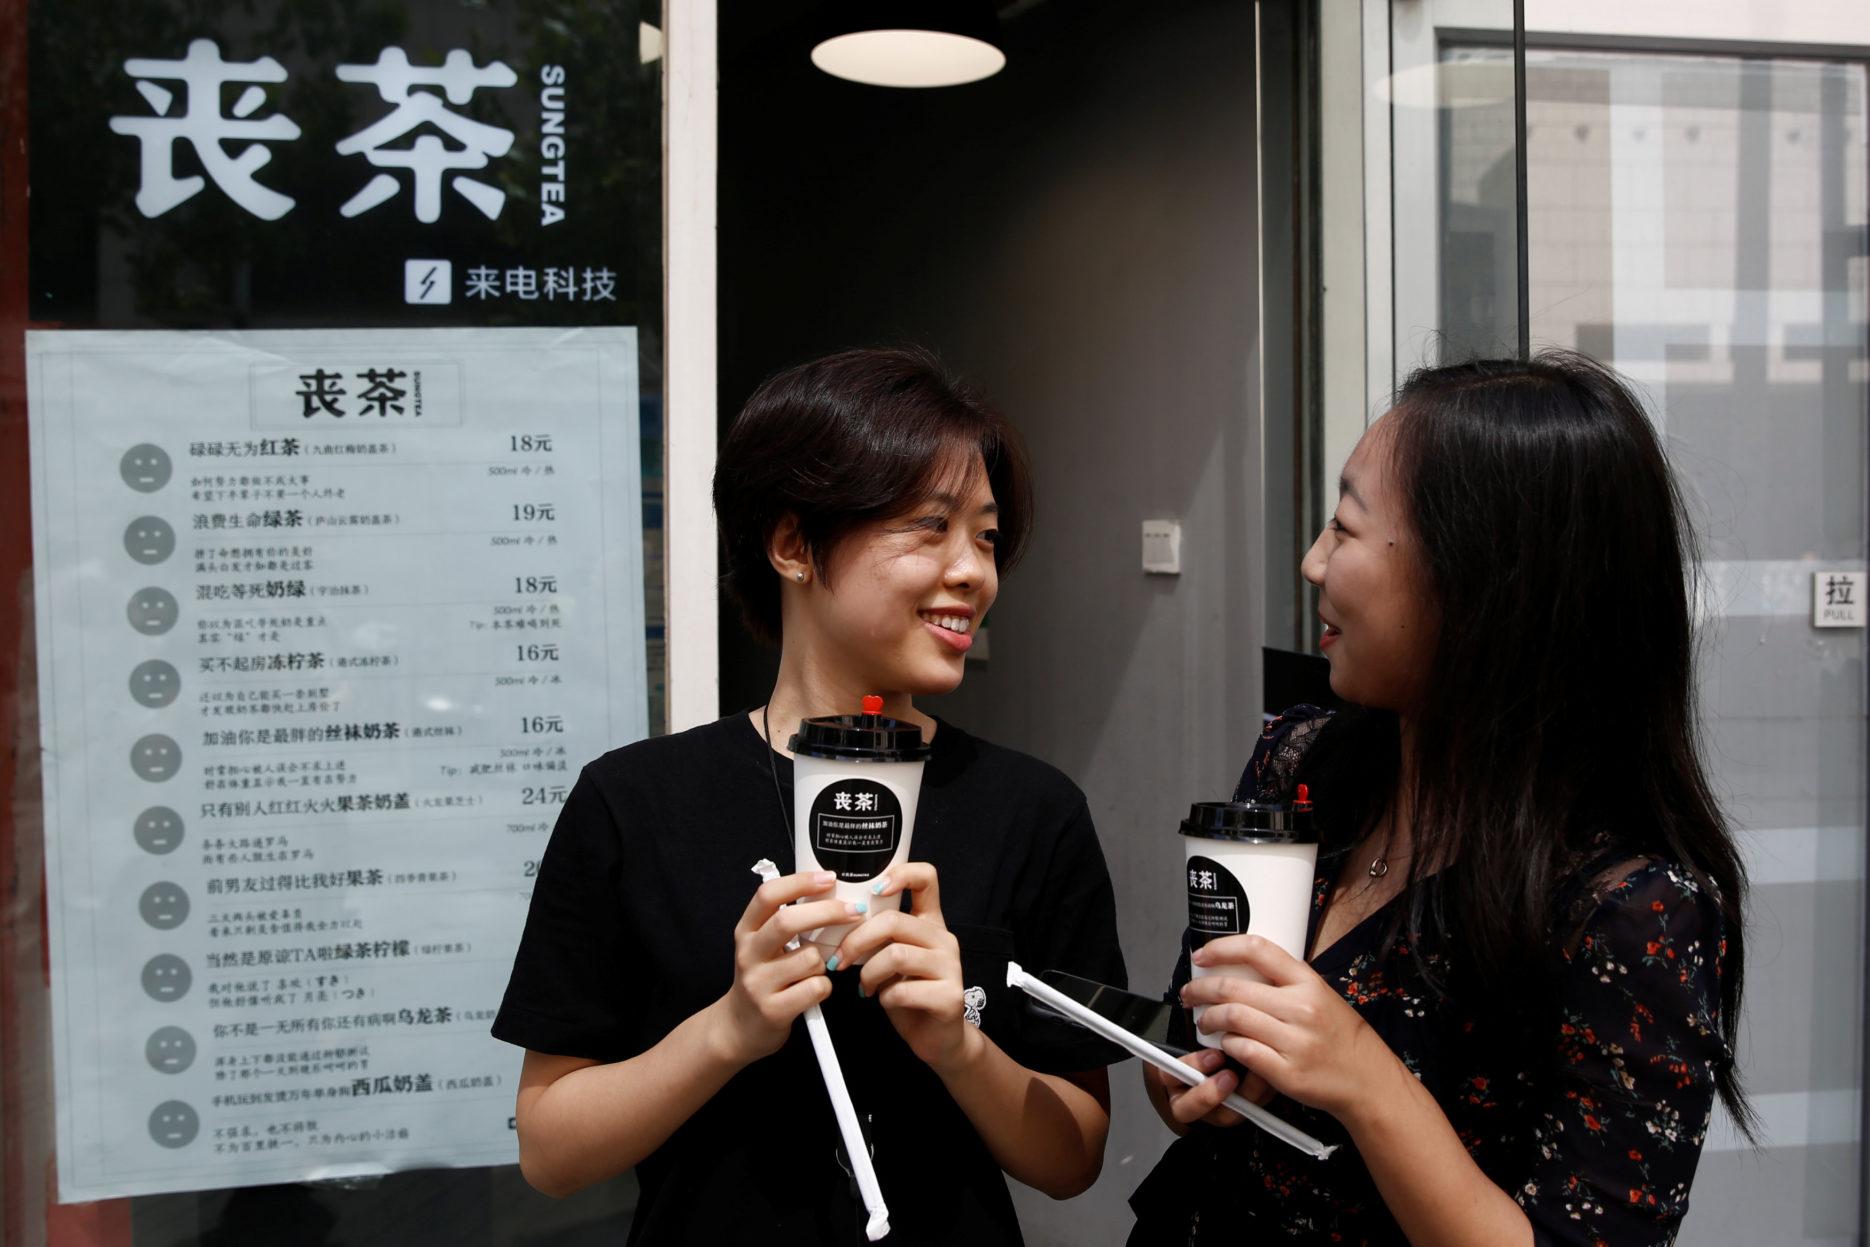 Sang culture in China. Credit: Reuters